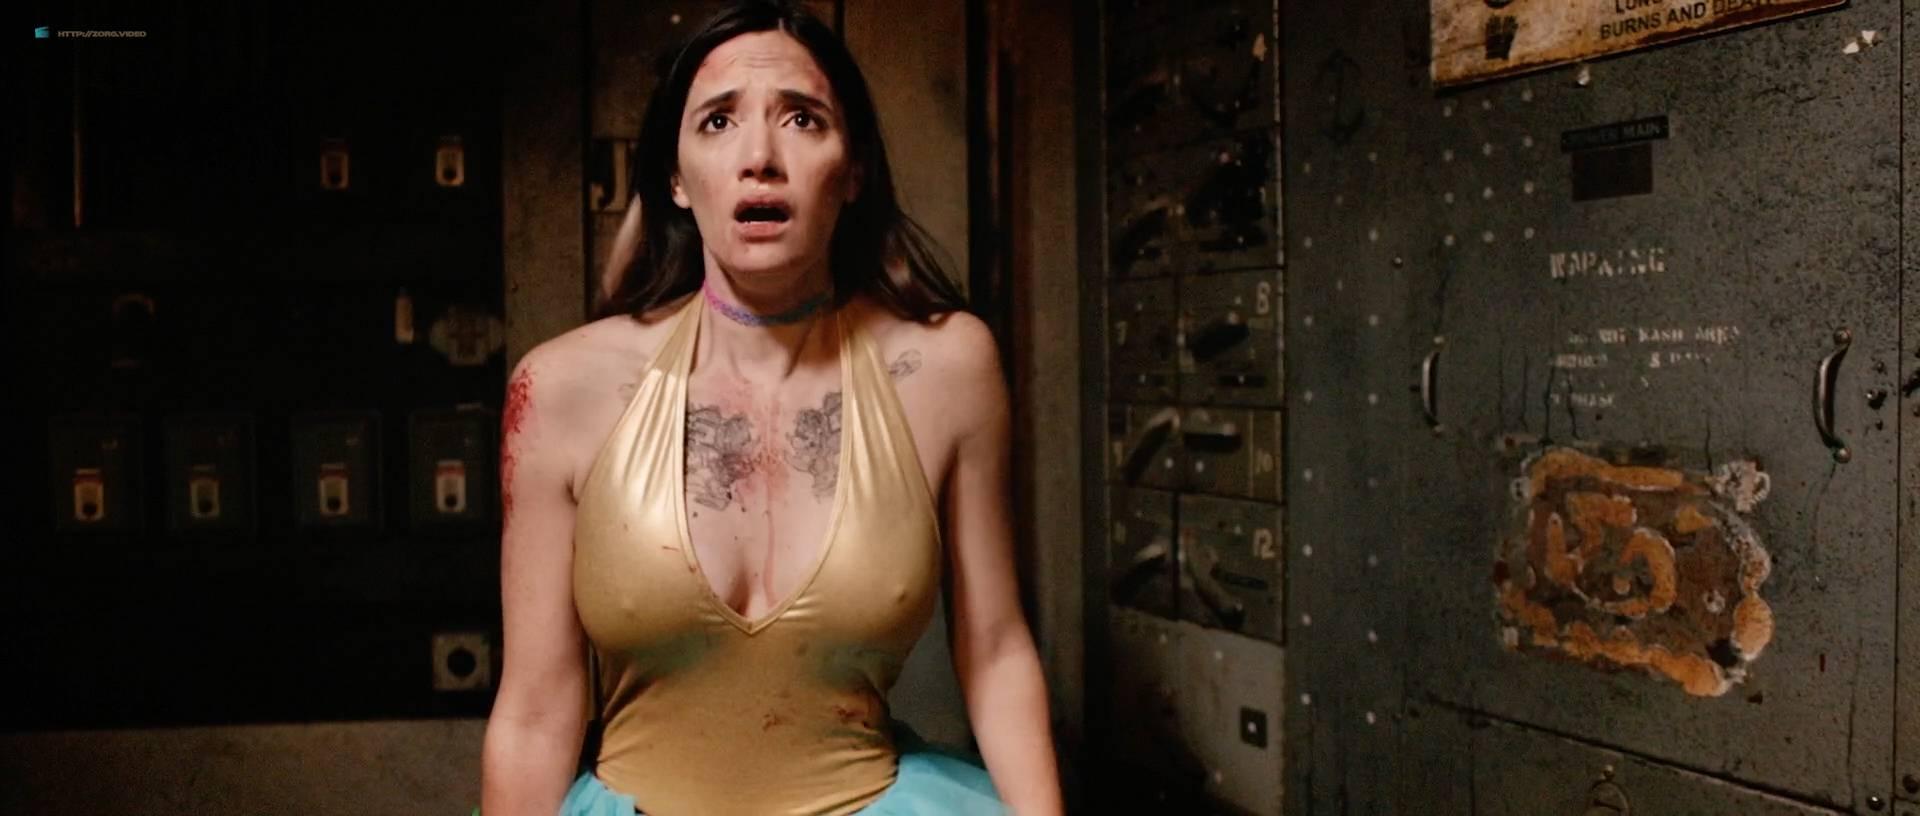 Sara-Malakul-Lane-nude-toples-Kelly-McCart-and-Amanda-Ruth-Ritchie-nude-too-Halloween-Pussy-Trap-Kill-Kill-2017-HD-1080p-Web-011.jpg